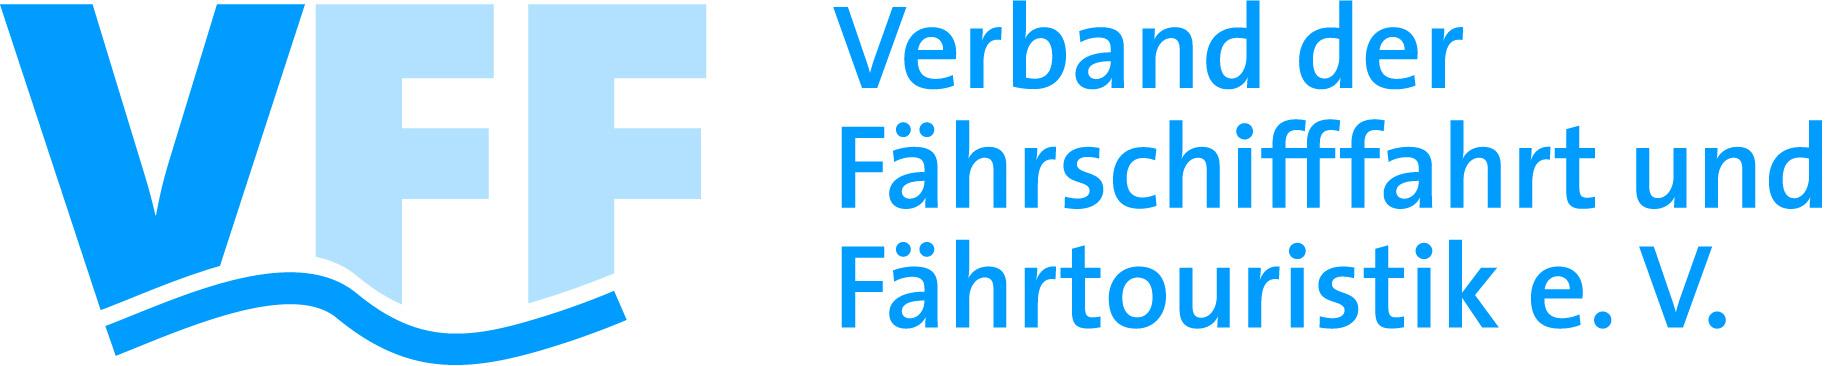 VFF_Logo06_4c-2